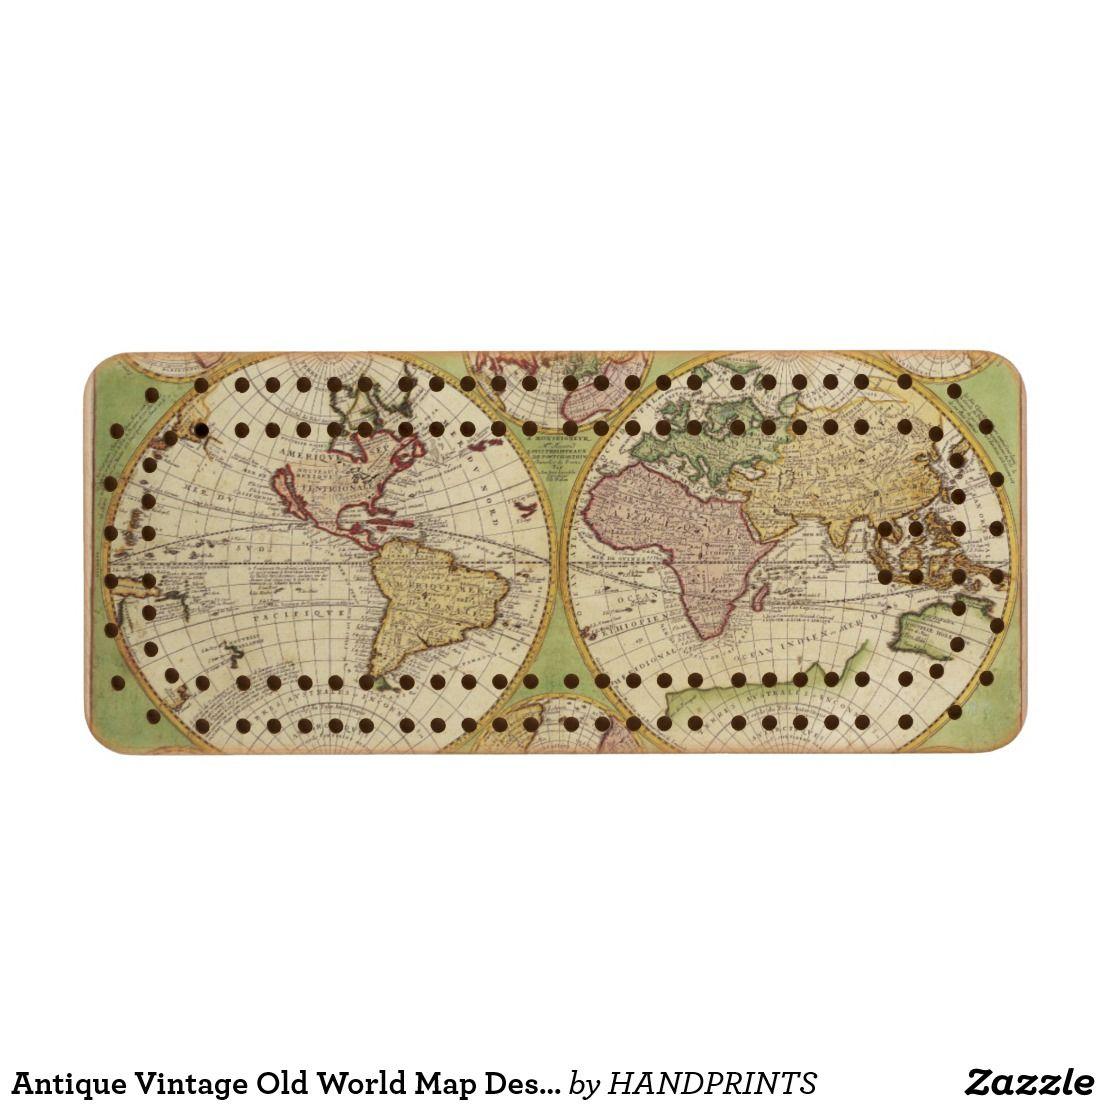 Antique vintage old world map design wood cribbage board custom antique vintage old world map design wood cribbage board custom gifts gumiabroncs Choice Image